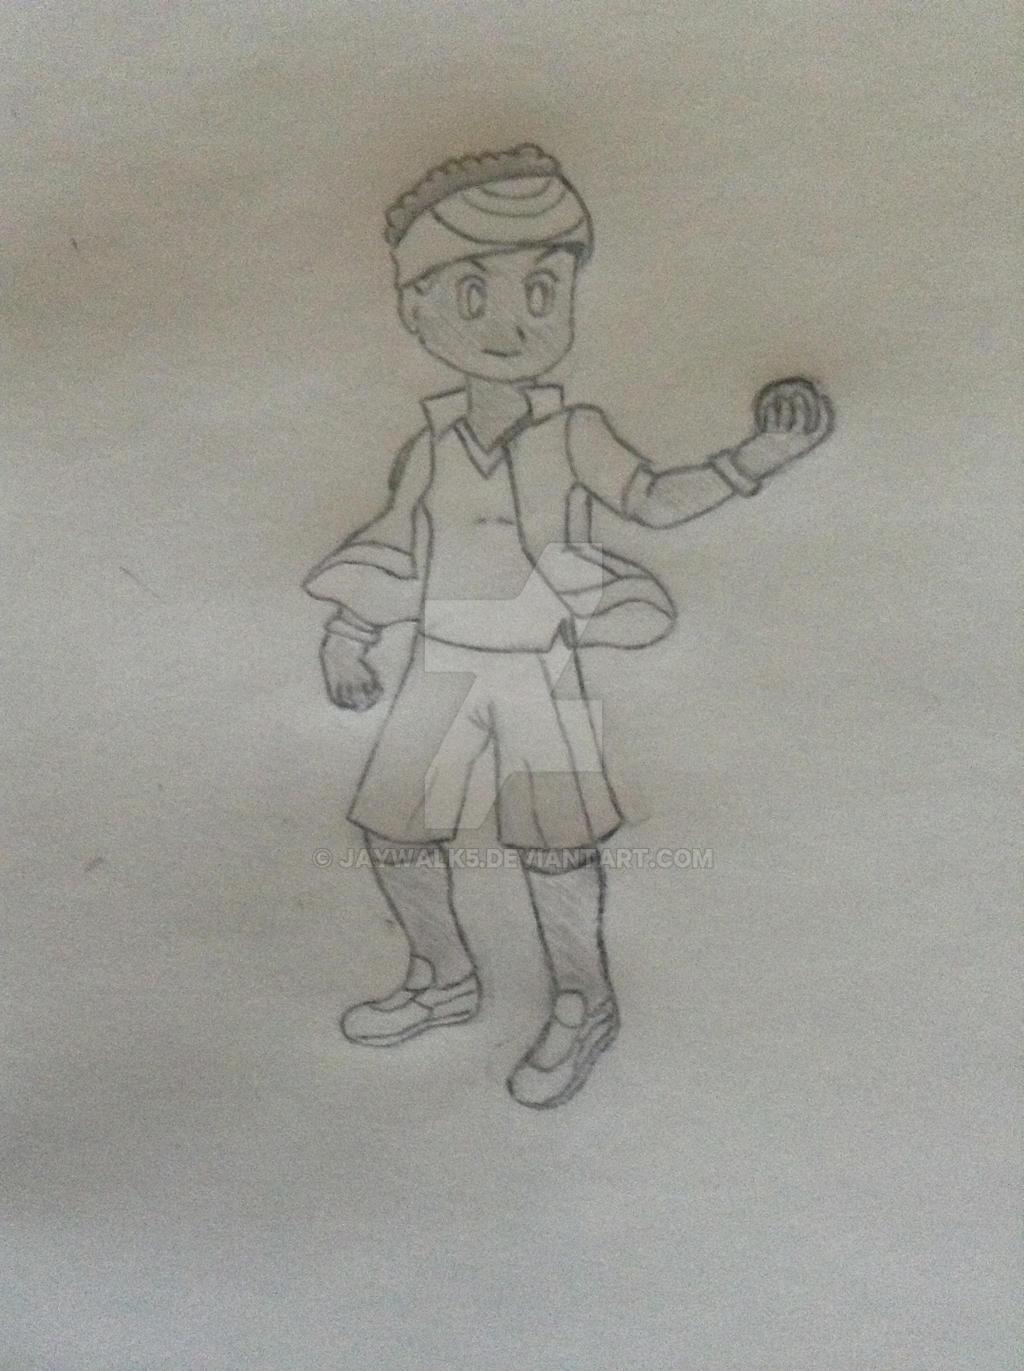 Jaywalk the Pokemon Trainer by Jaywalk5